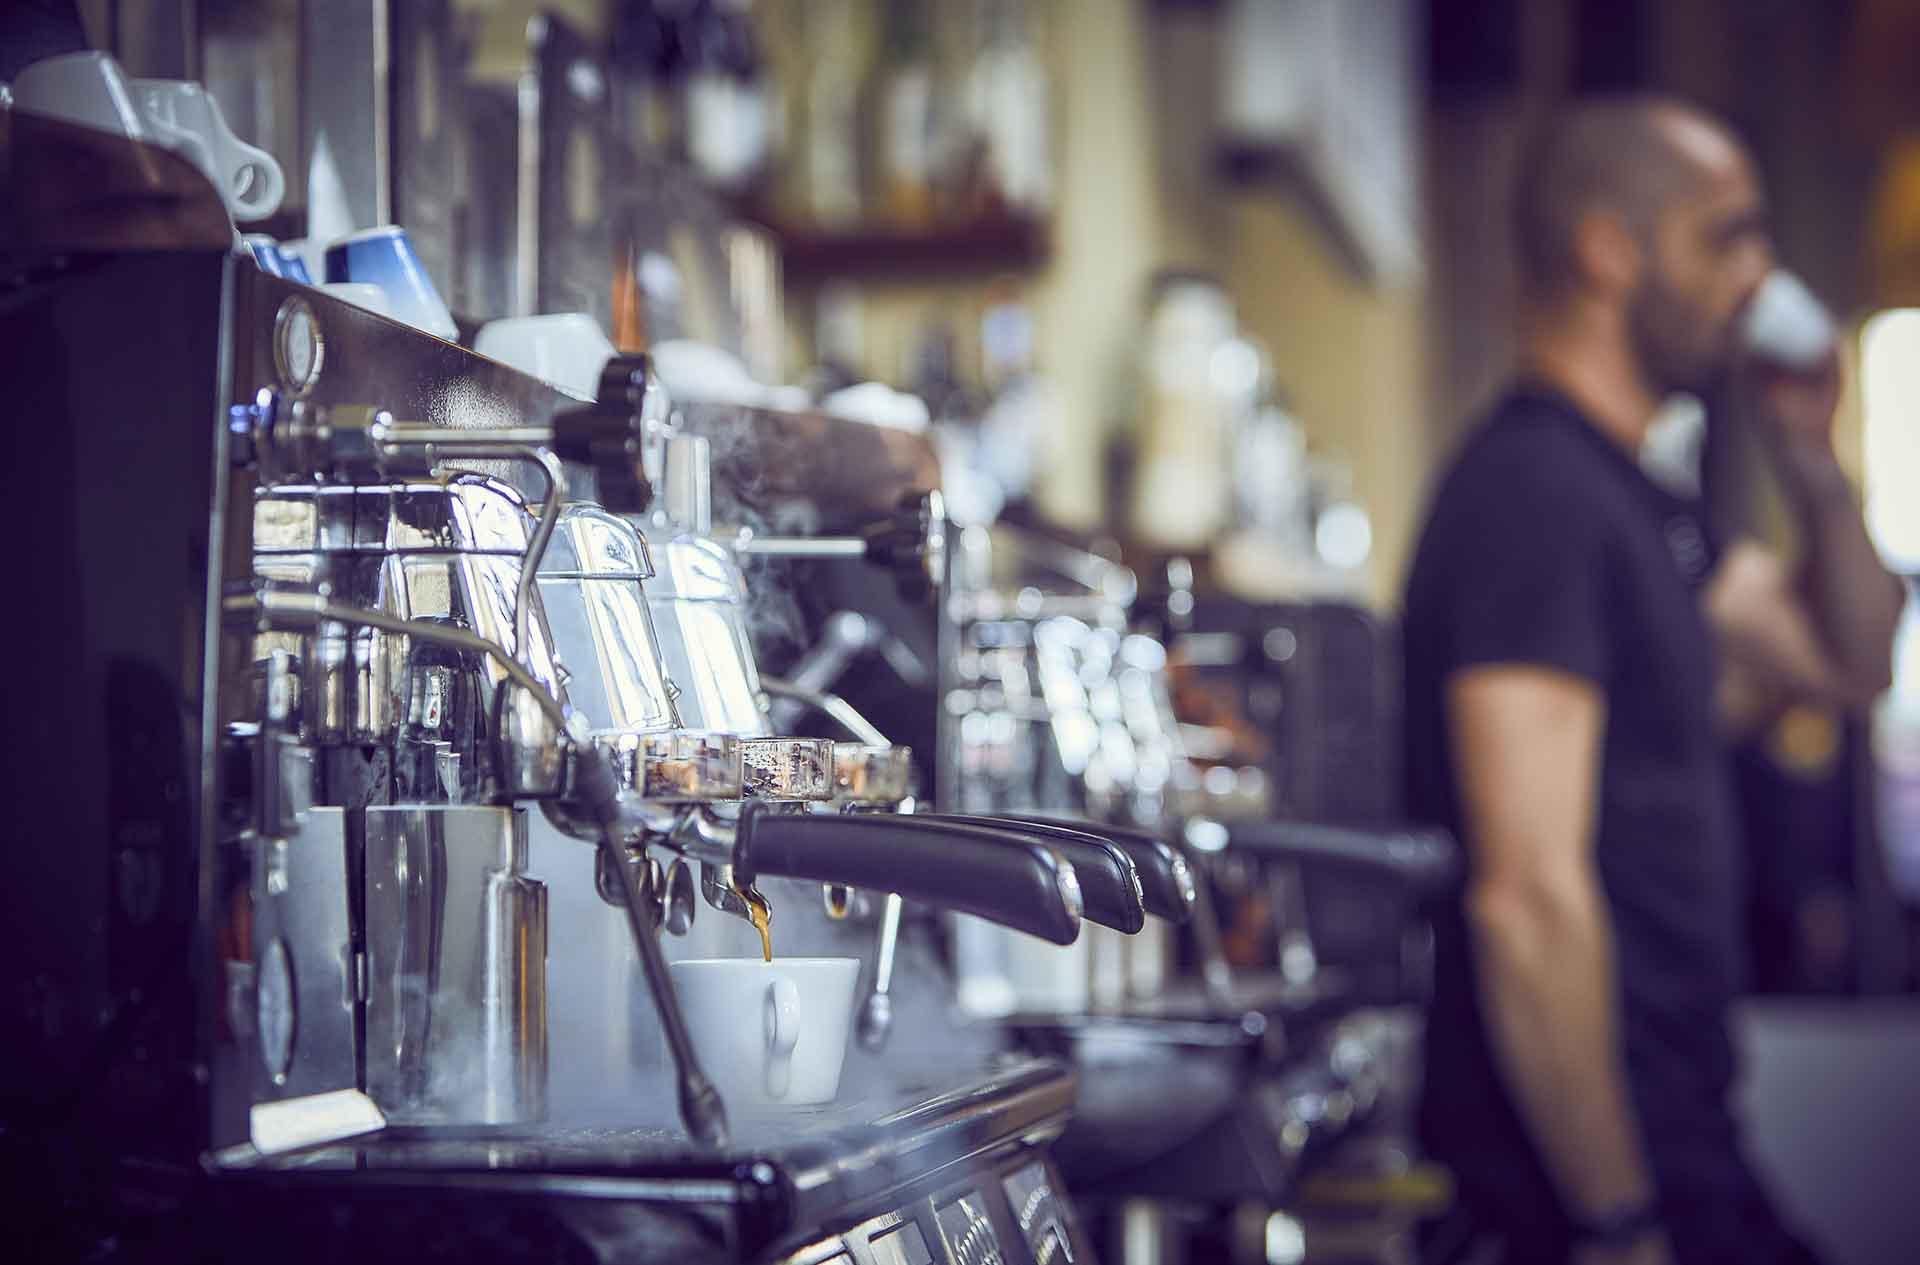 Snodo Pausa caffe - piatti - 3